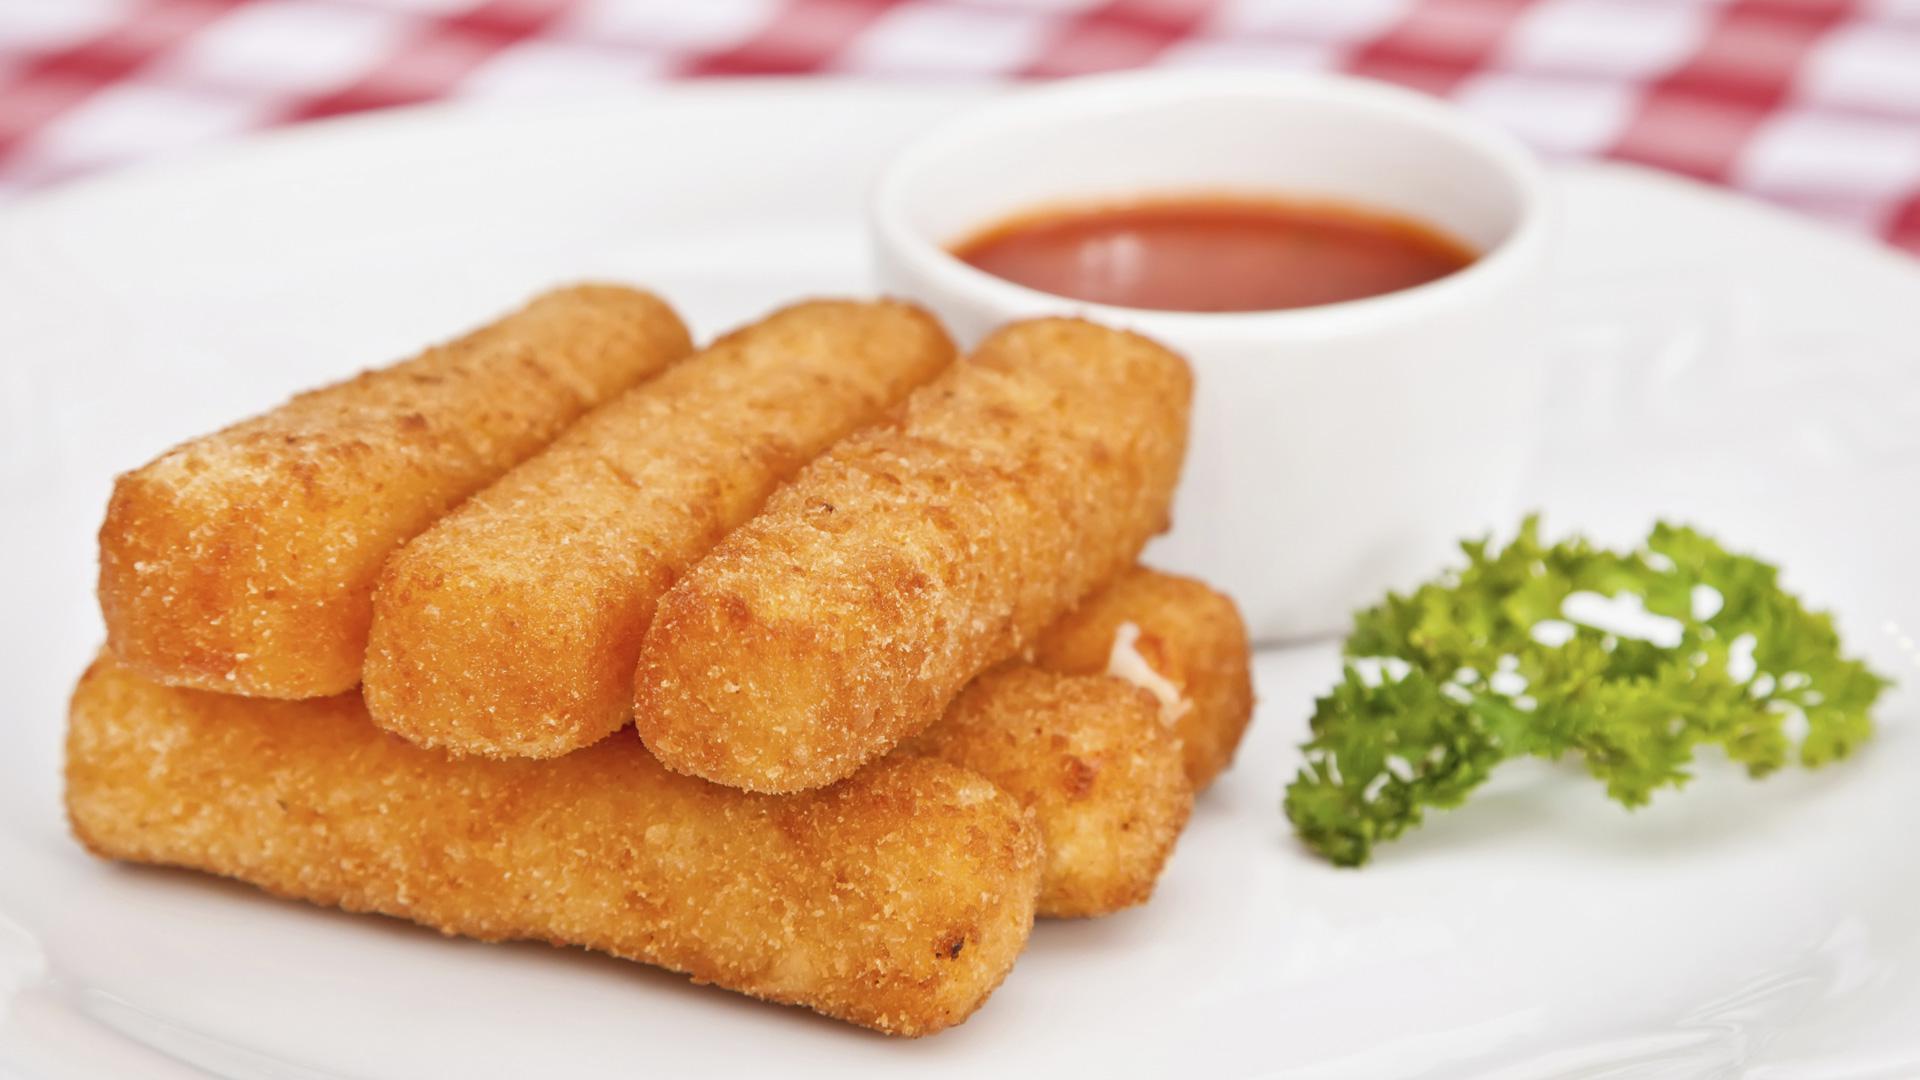 McDonald's mozzarella sticks are a terrible, tasty idea